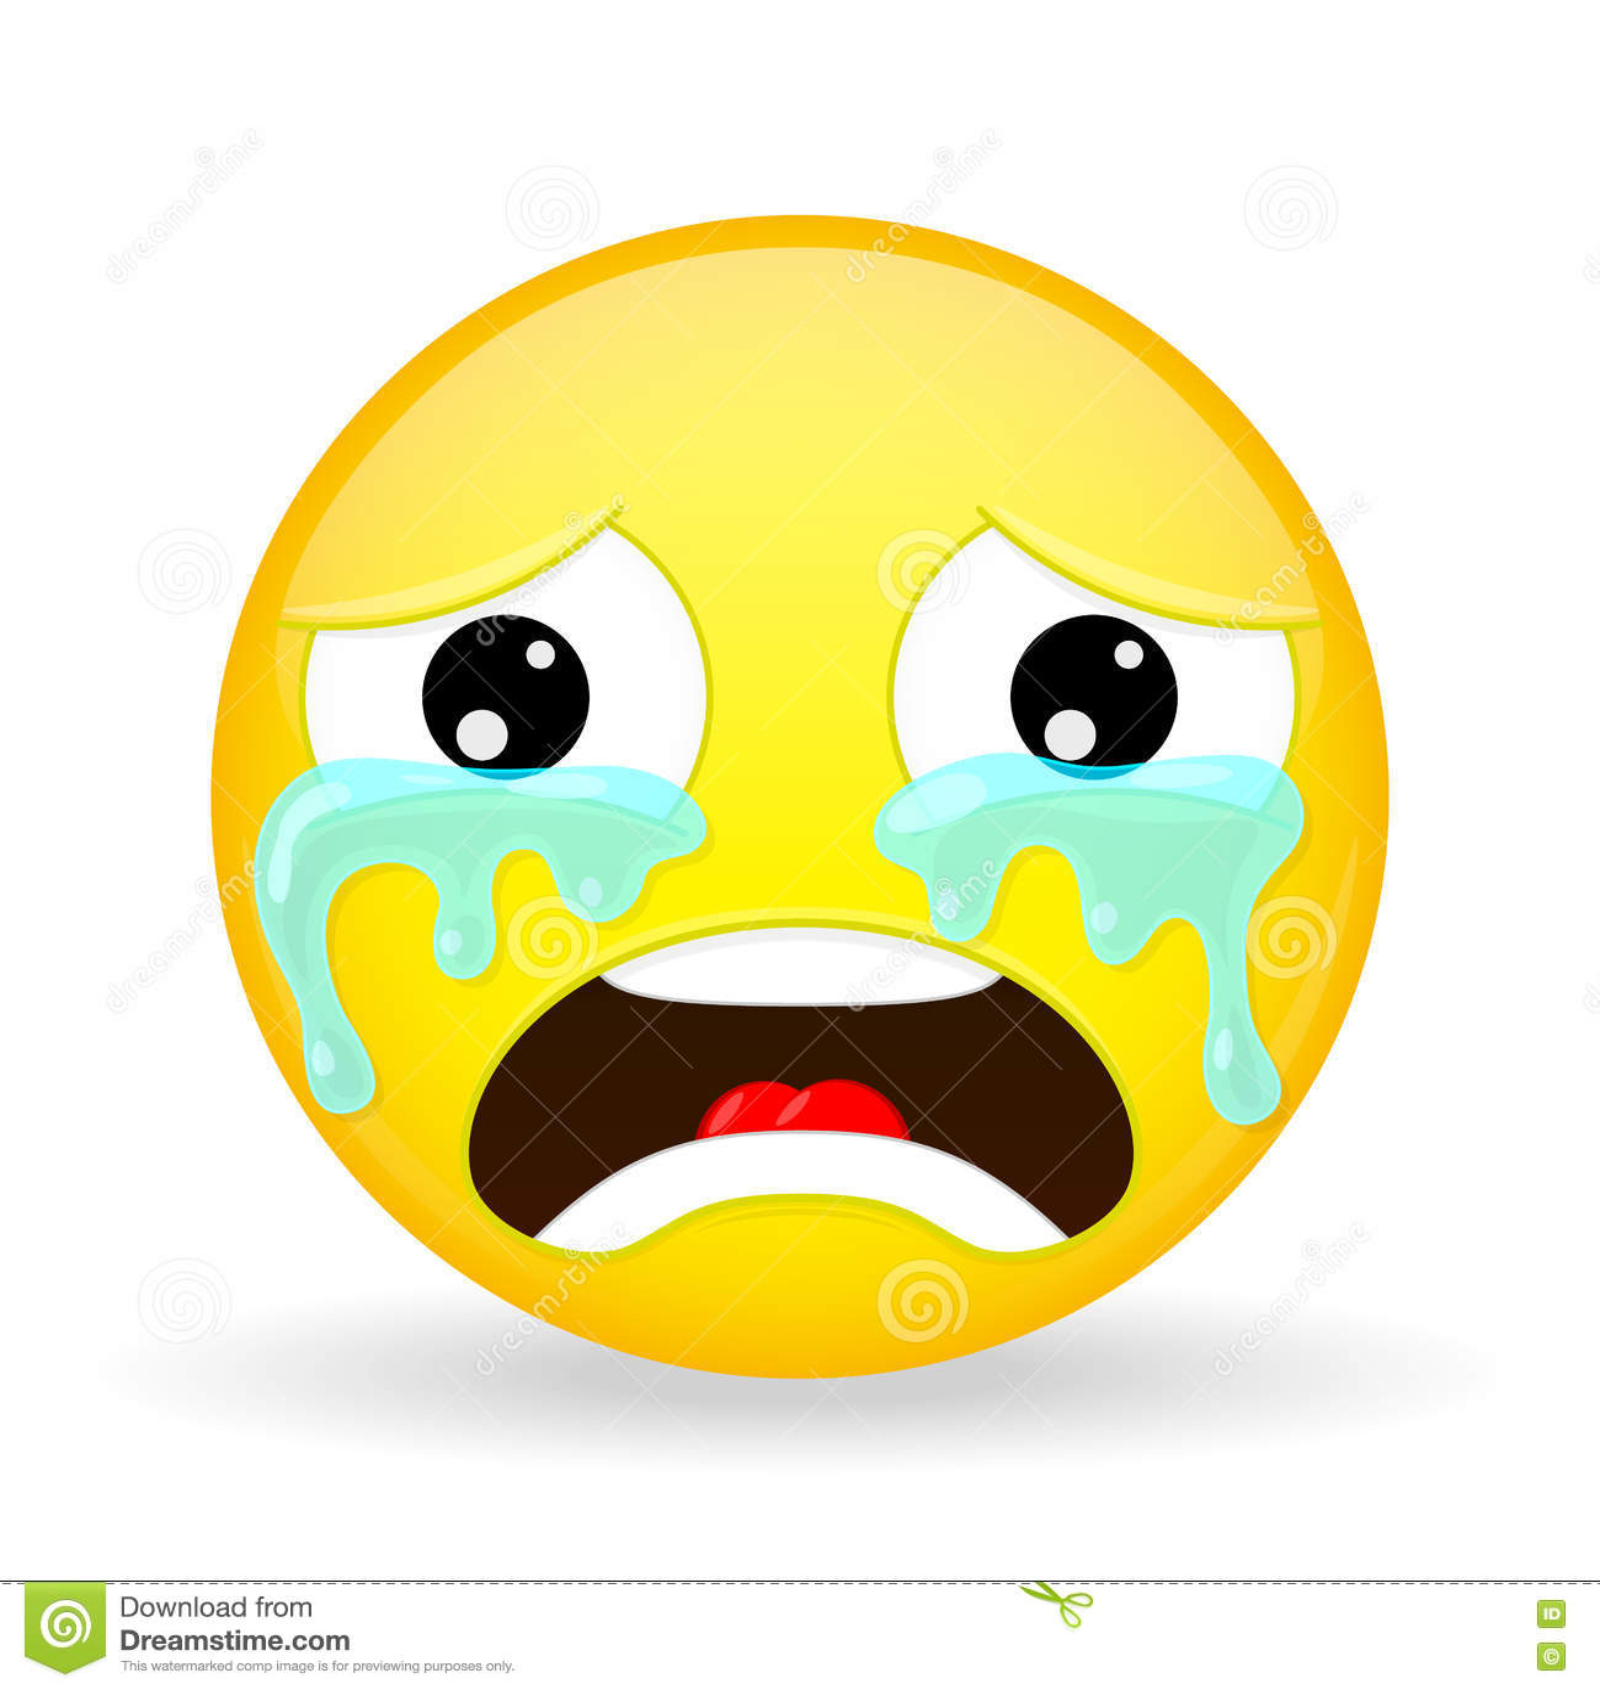 Emoji Drawings Google Search Emoji Dessin Emoji Coeur Bisou